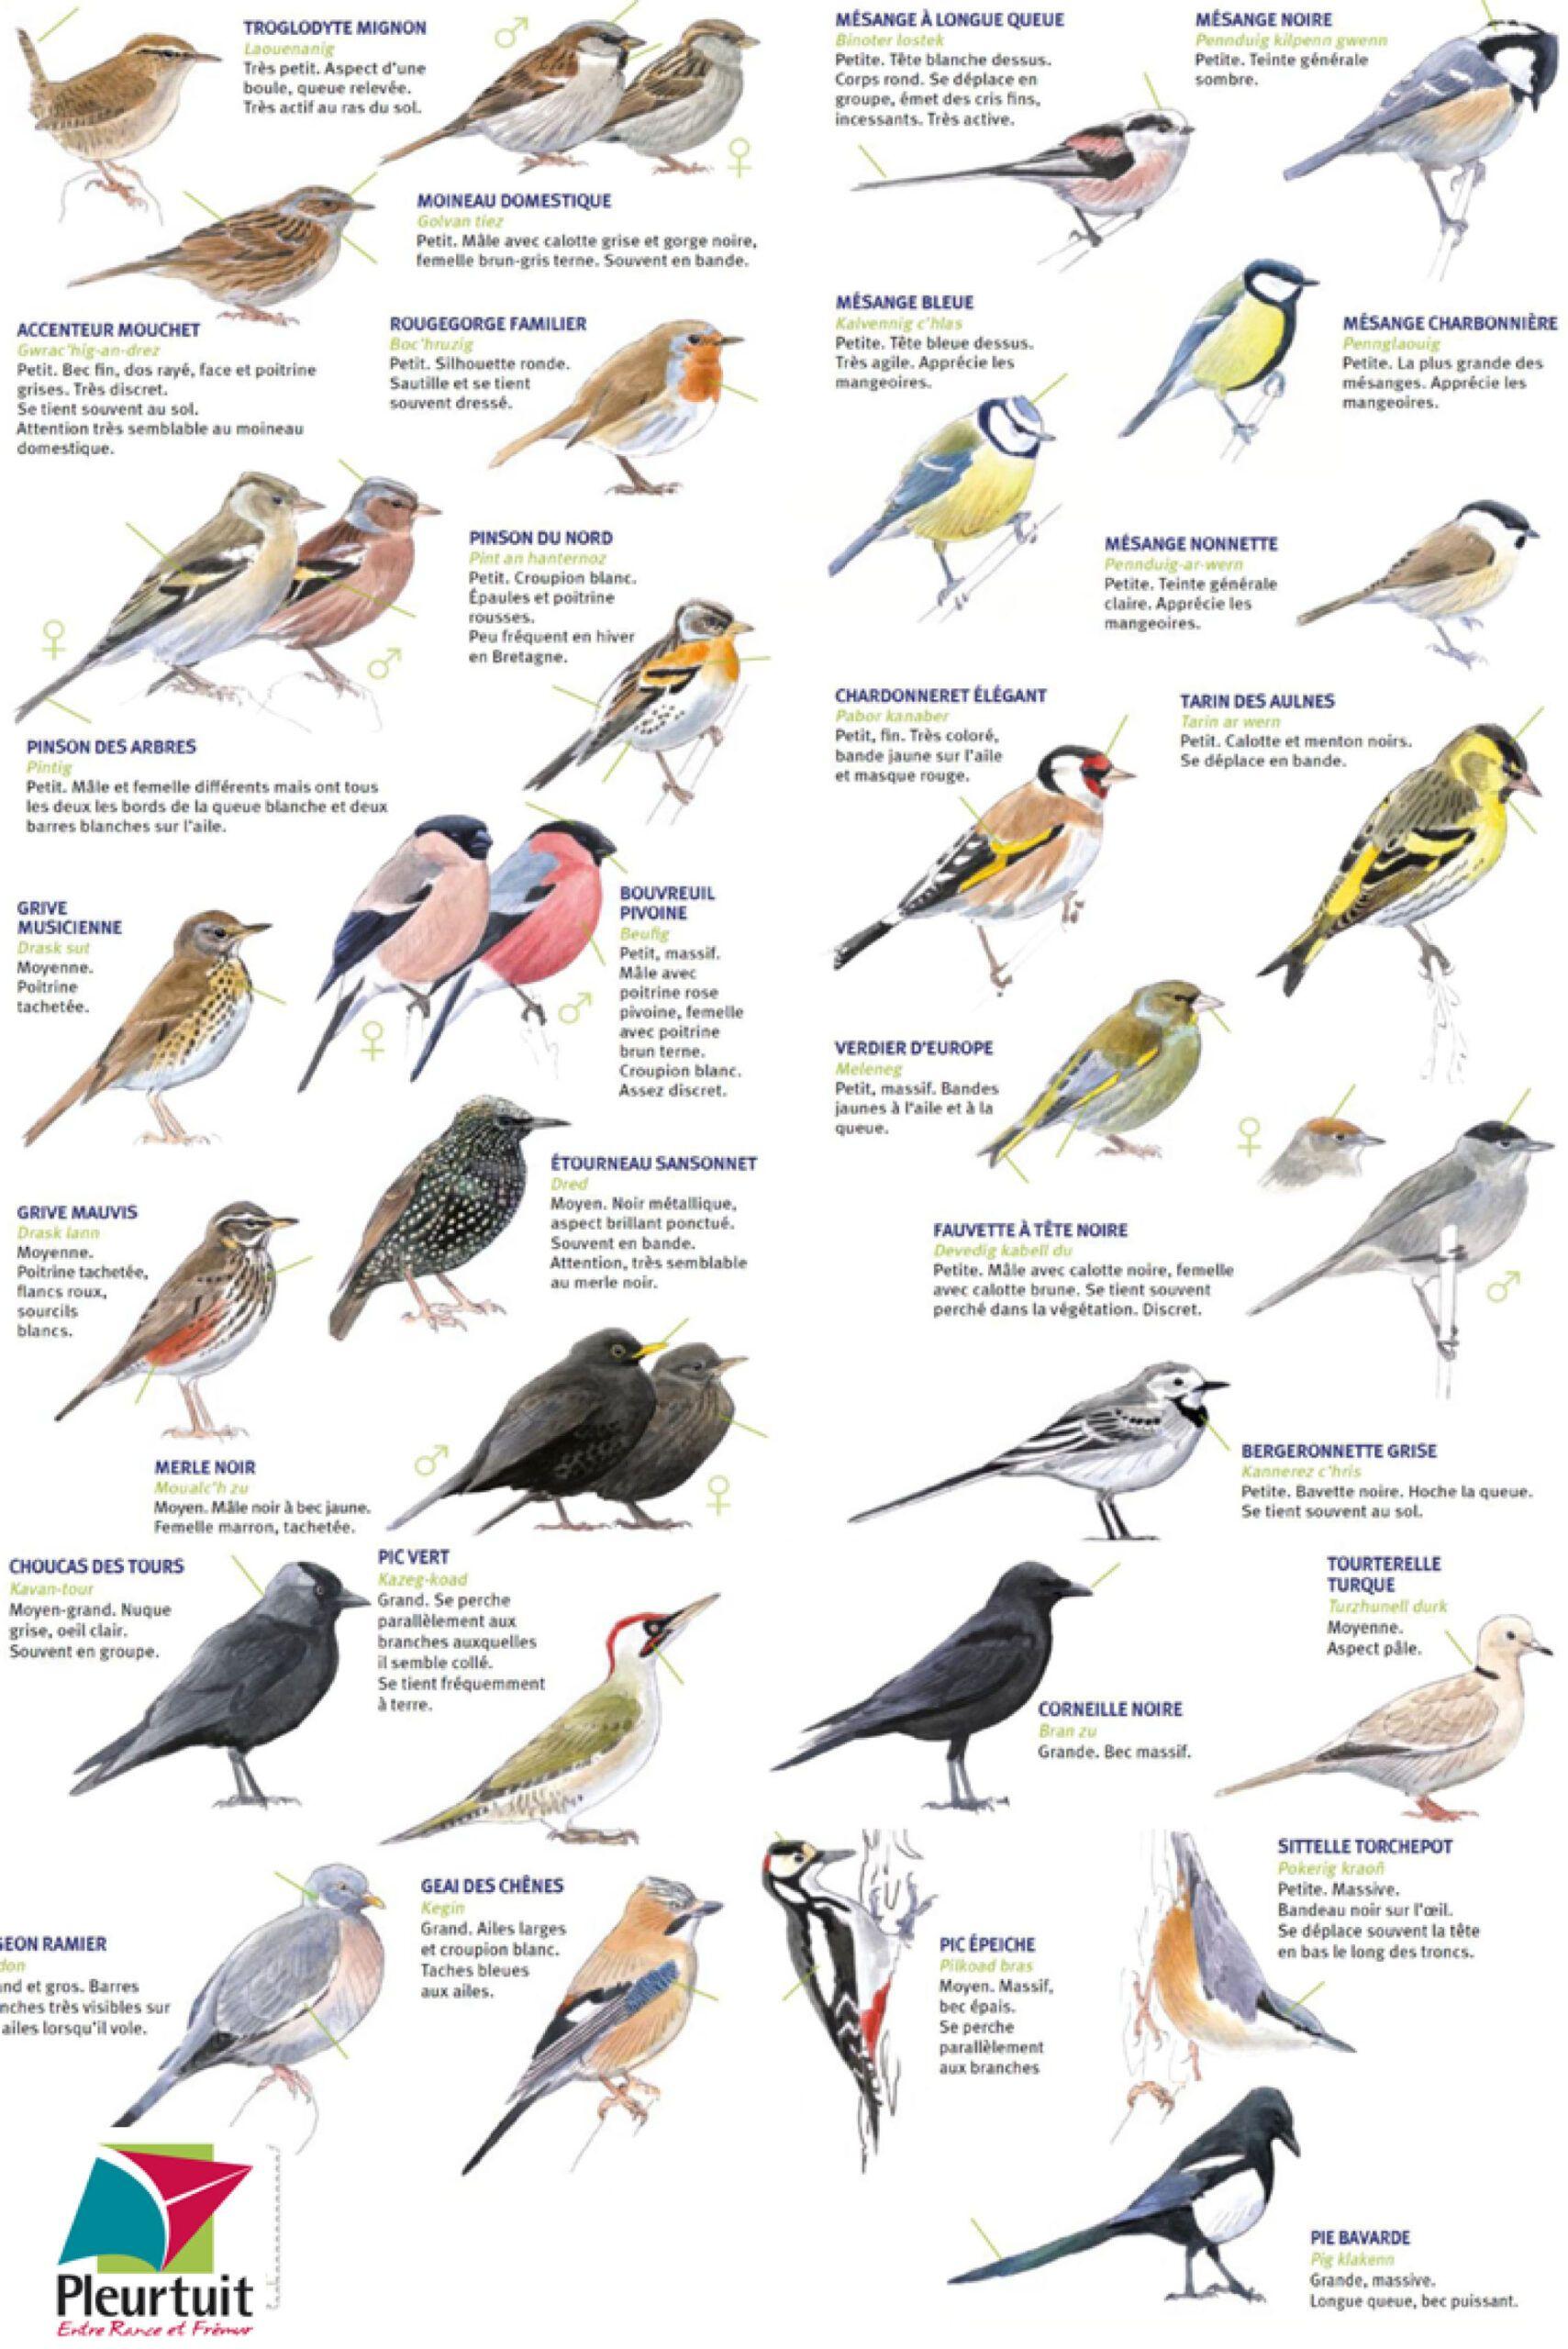 Oiseaux De Nos Jardins Bretagne : oiseaux, jardins, bretagne, Oiseaux, Jardins., Janvier, Février, Jardins,, Bretagne,, Nourriture